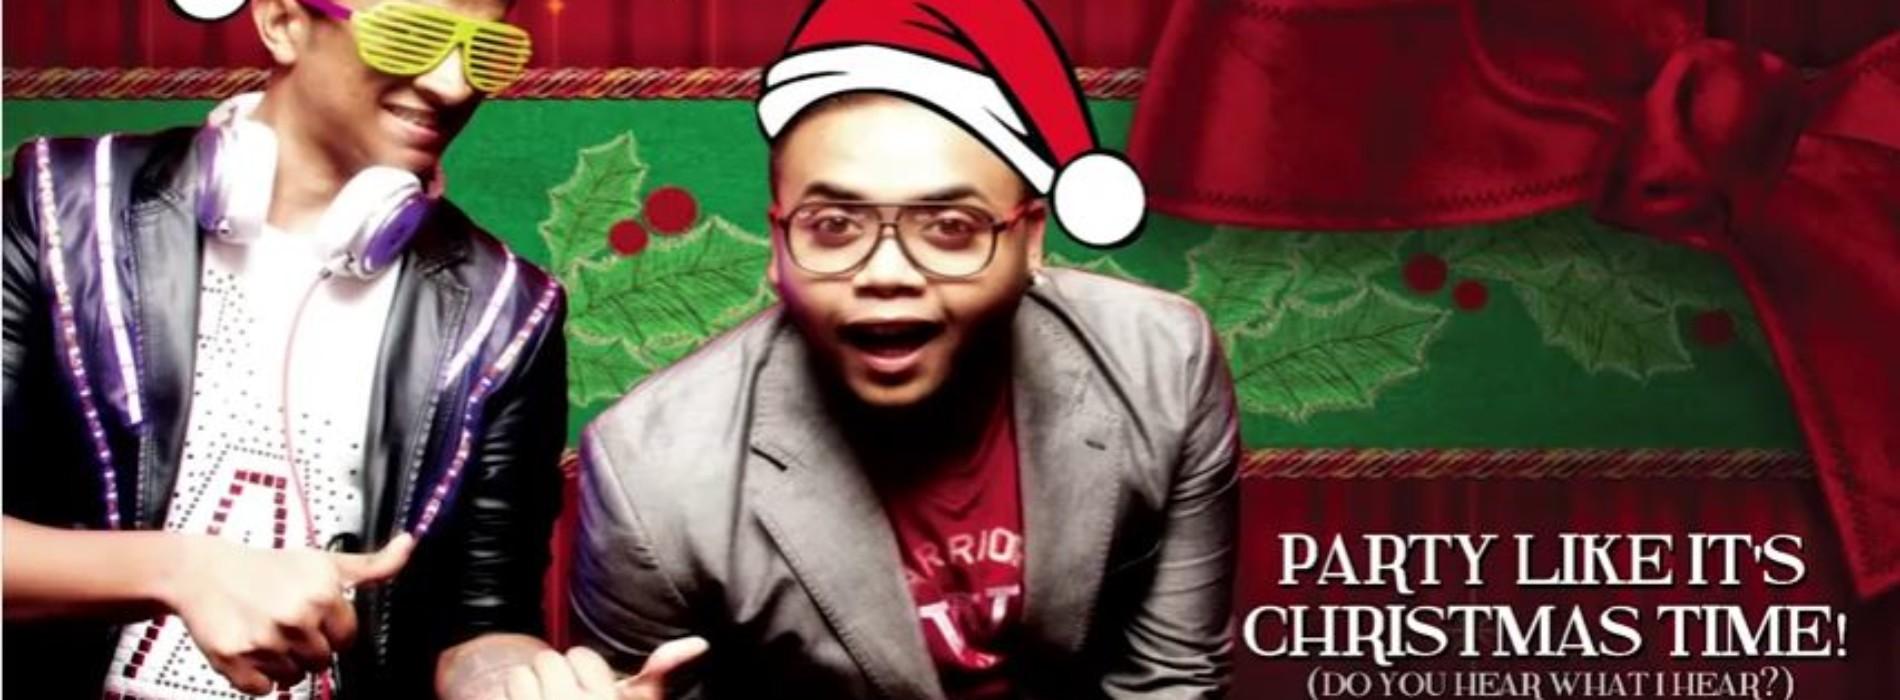 Decibel XMas Picks: #2 – The Sherifs : Party Like It's Christmas Time! [Do You Hear What I Hear?]